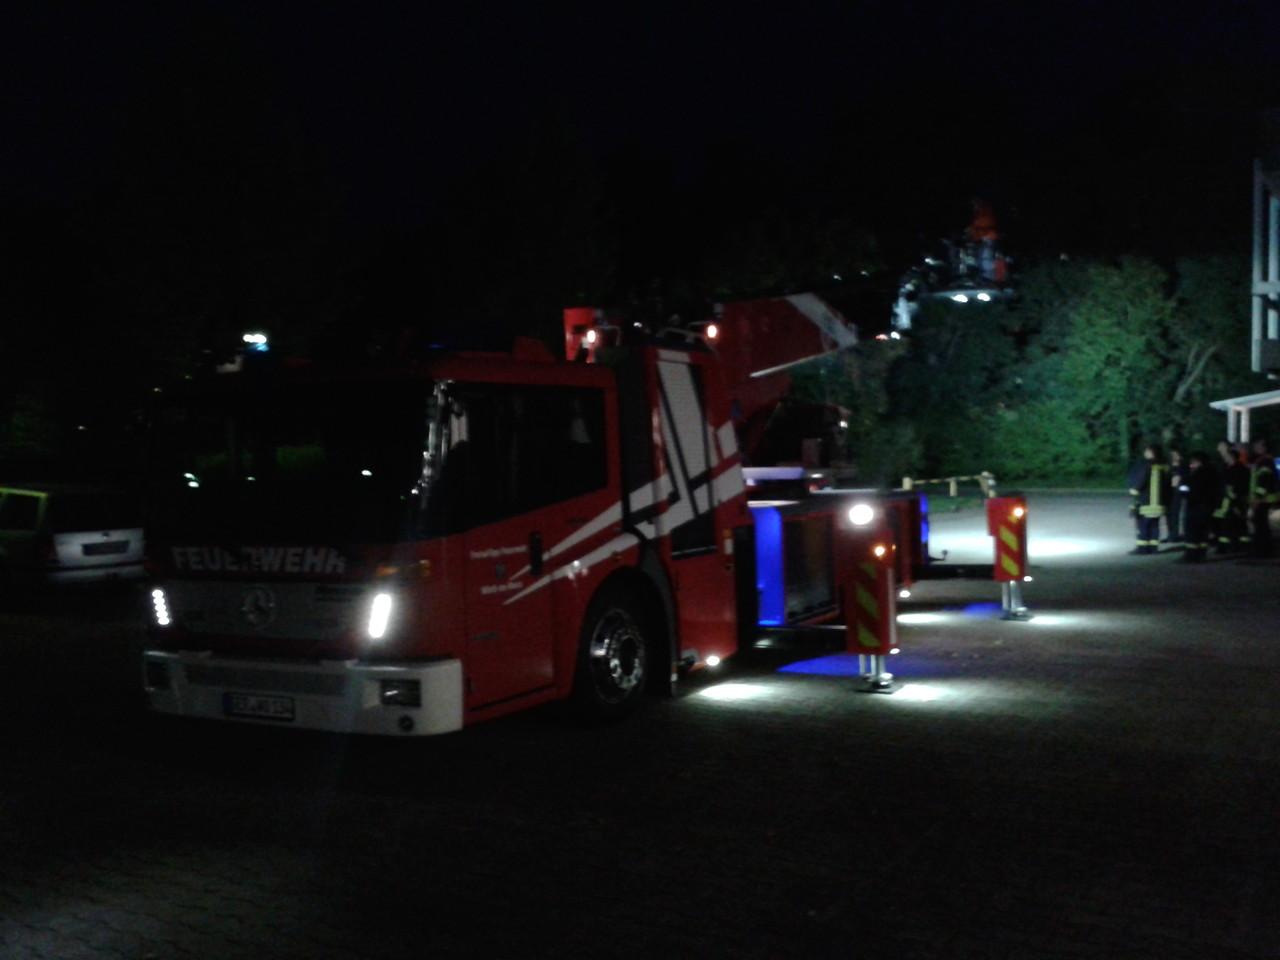 Das Fahrzeug bei Nacht